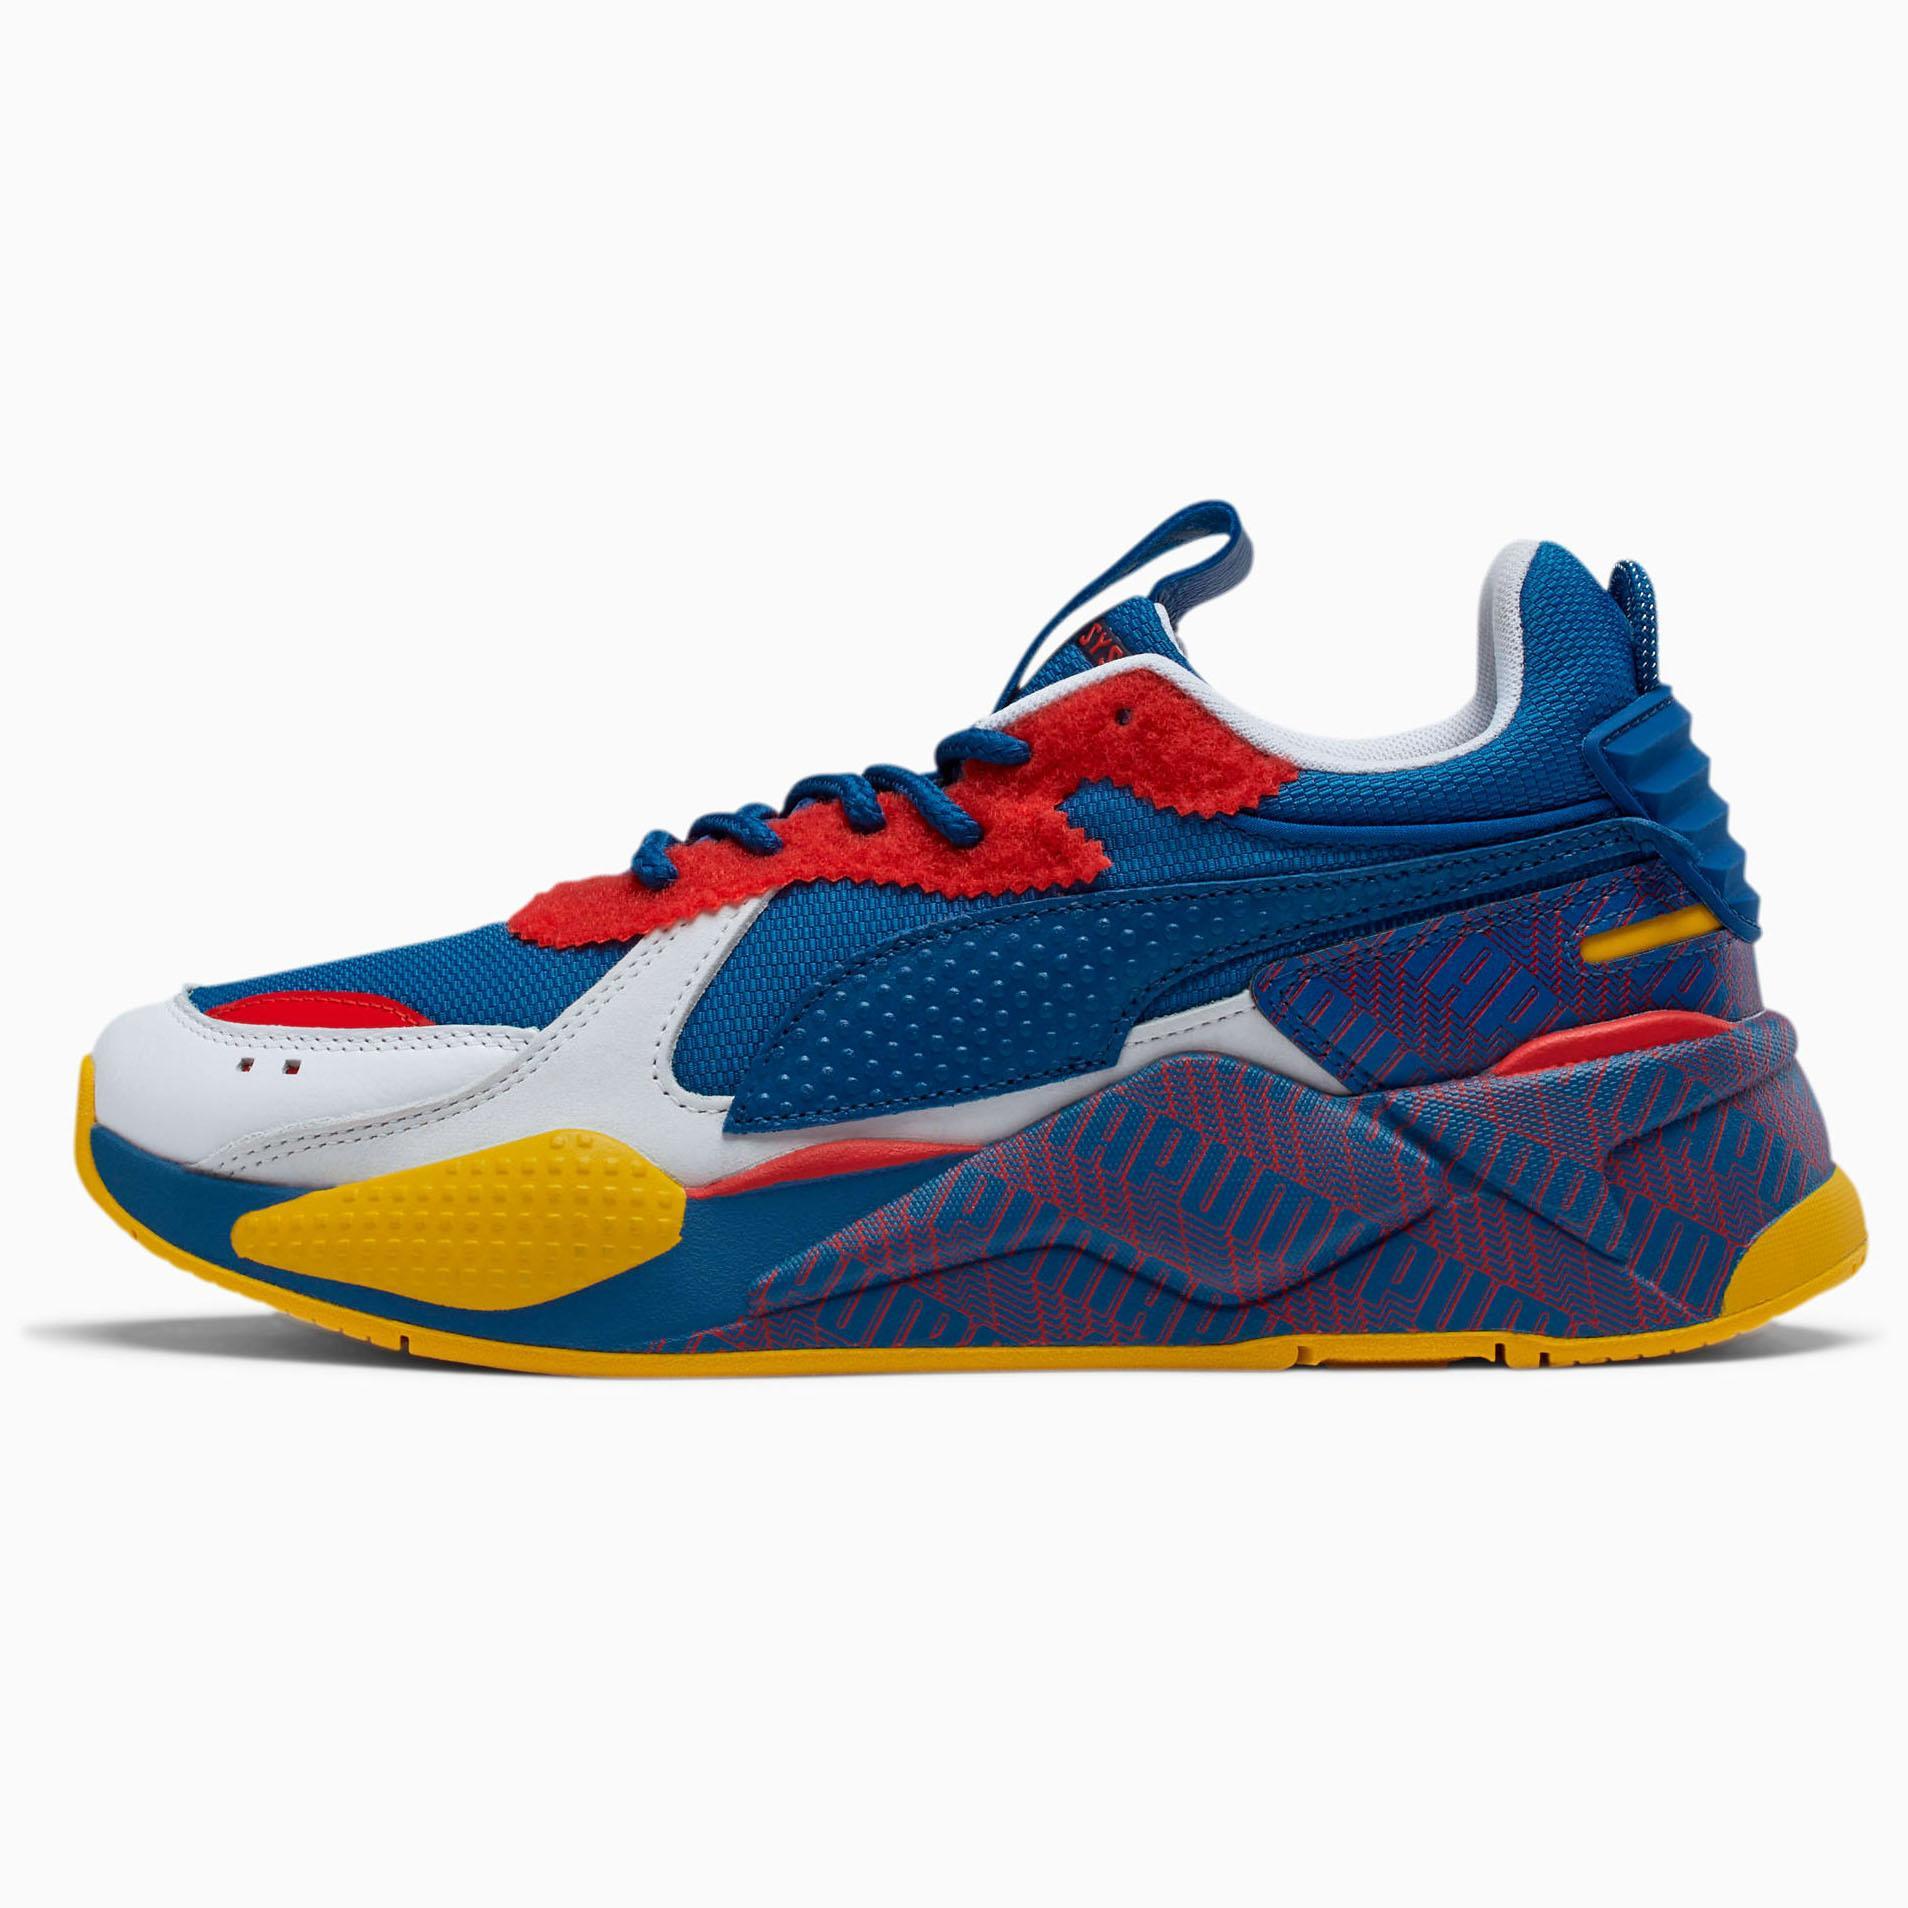 Puma 彪马 RS-X Subvert Men's Sneakers 男子休闲鞋